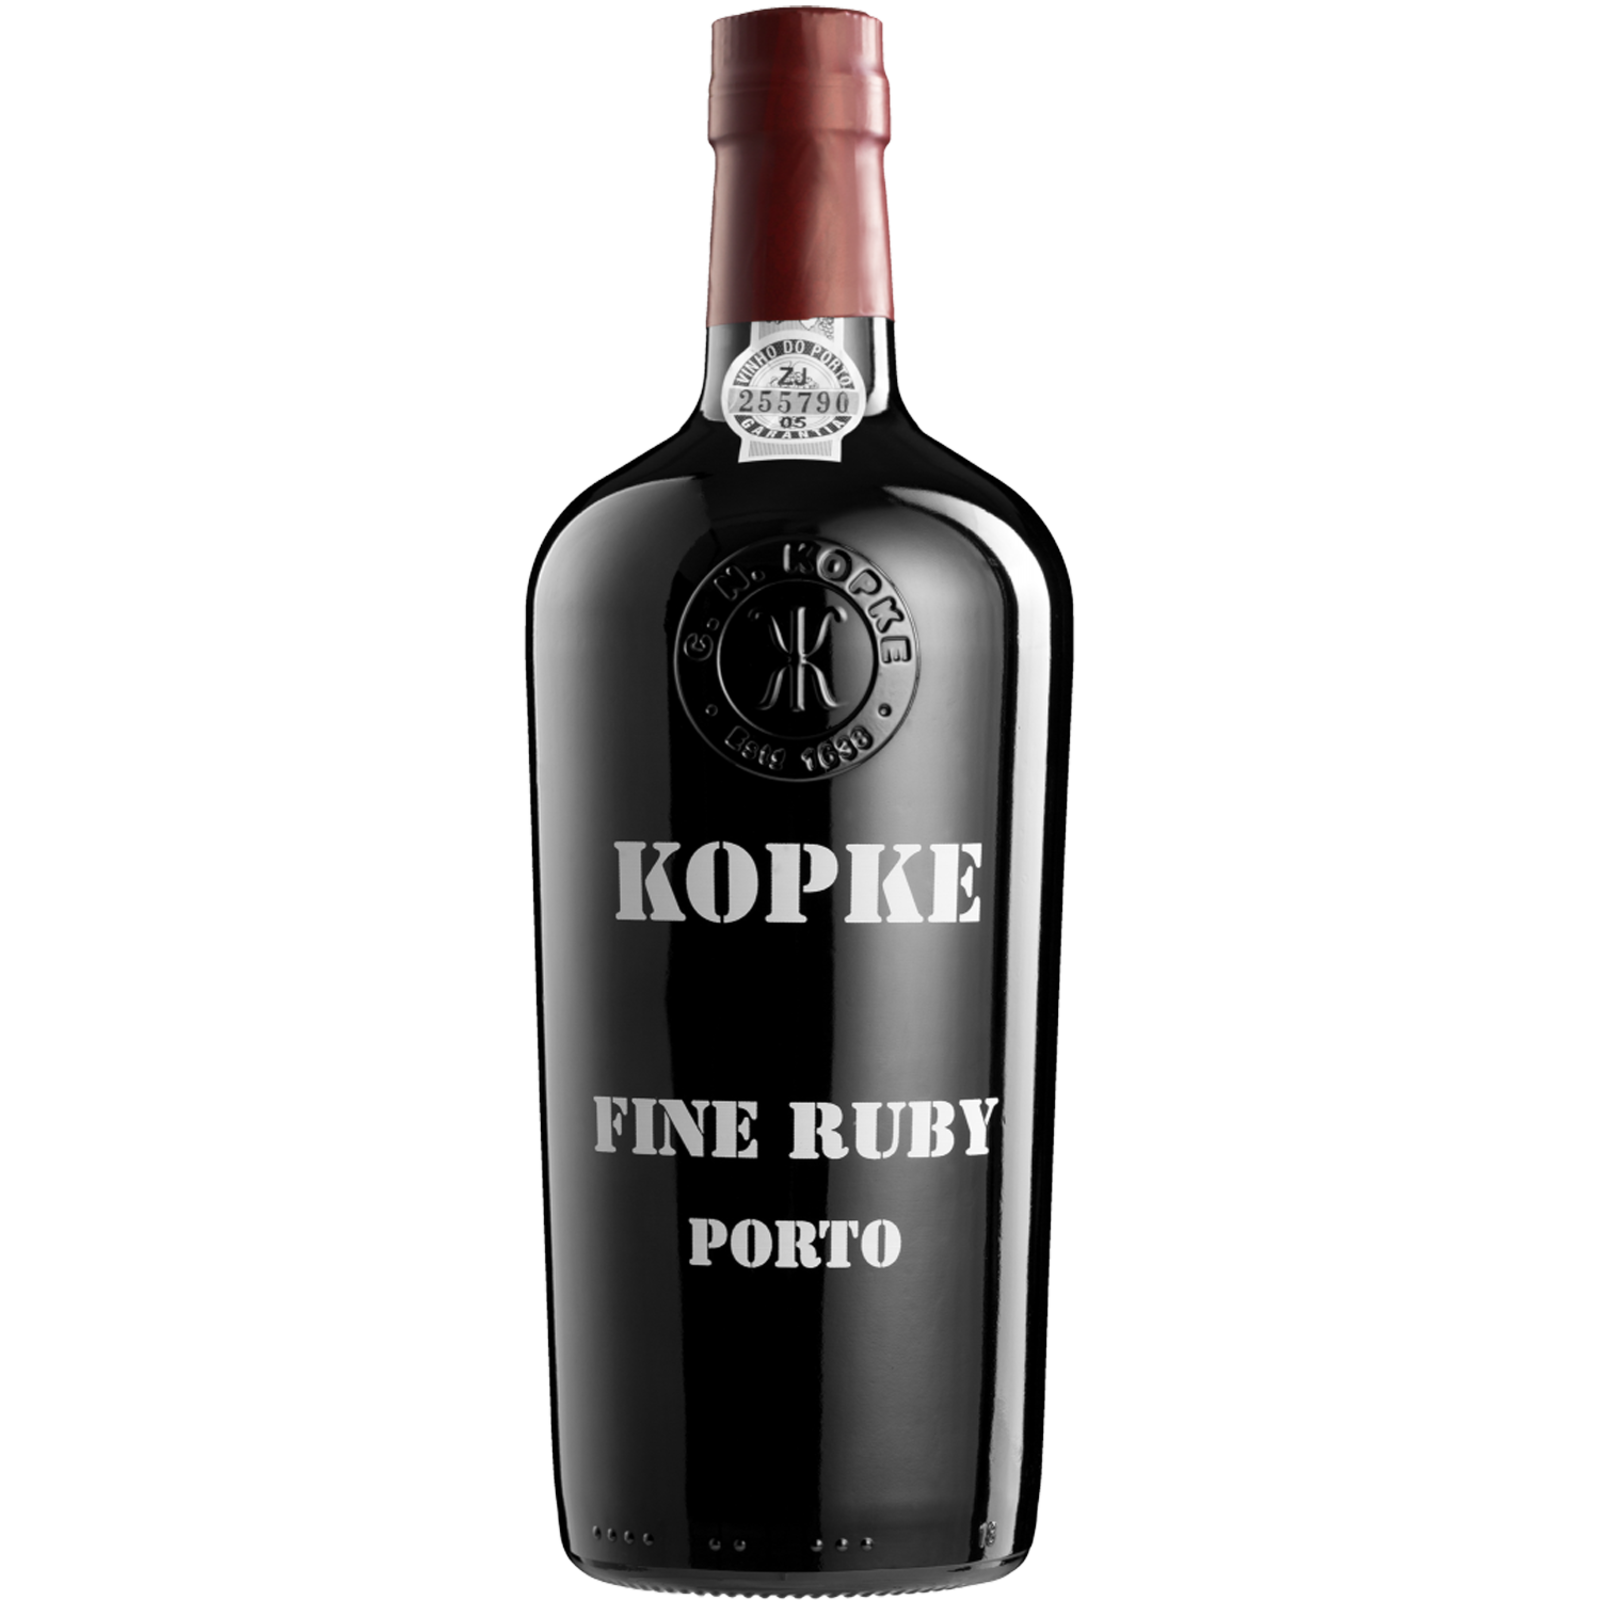 Kopke Kopke Fine Ruby Port